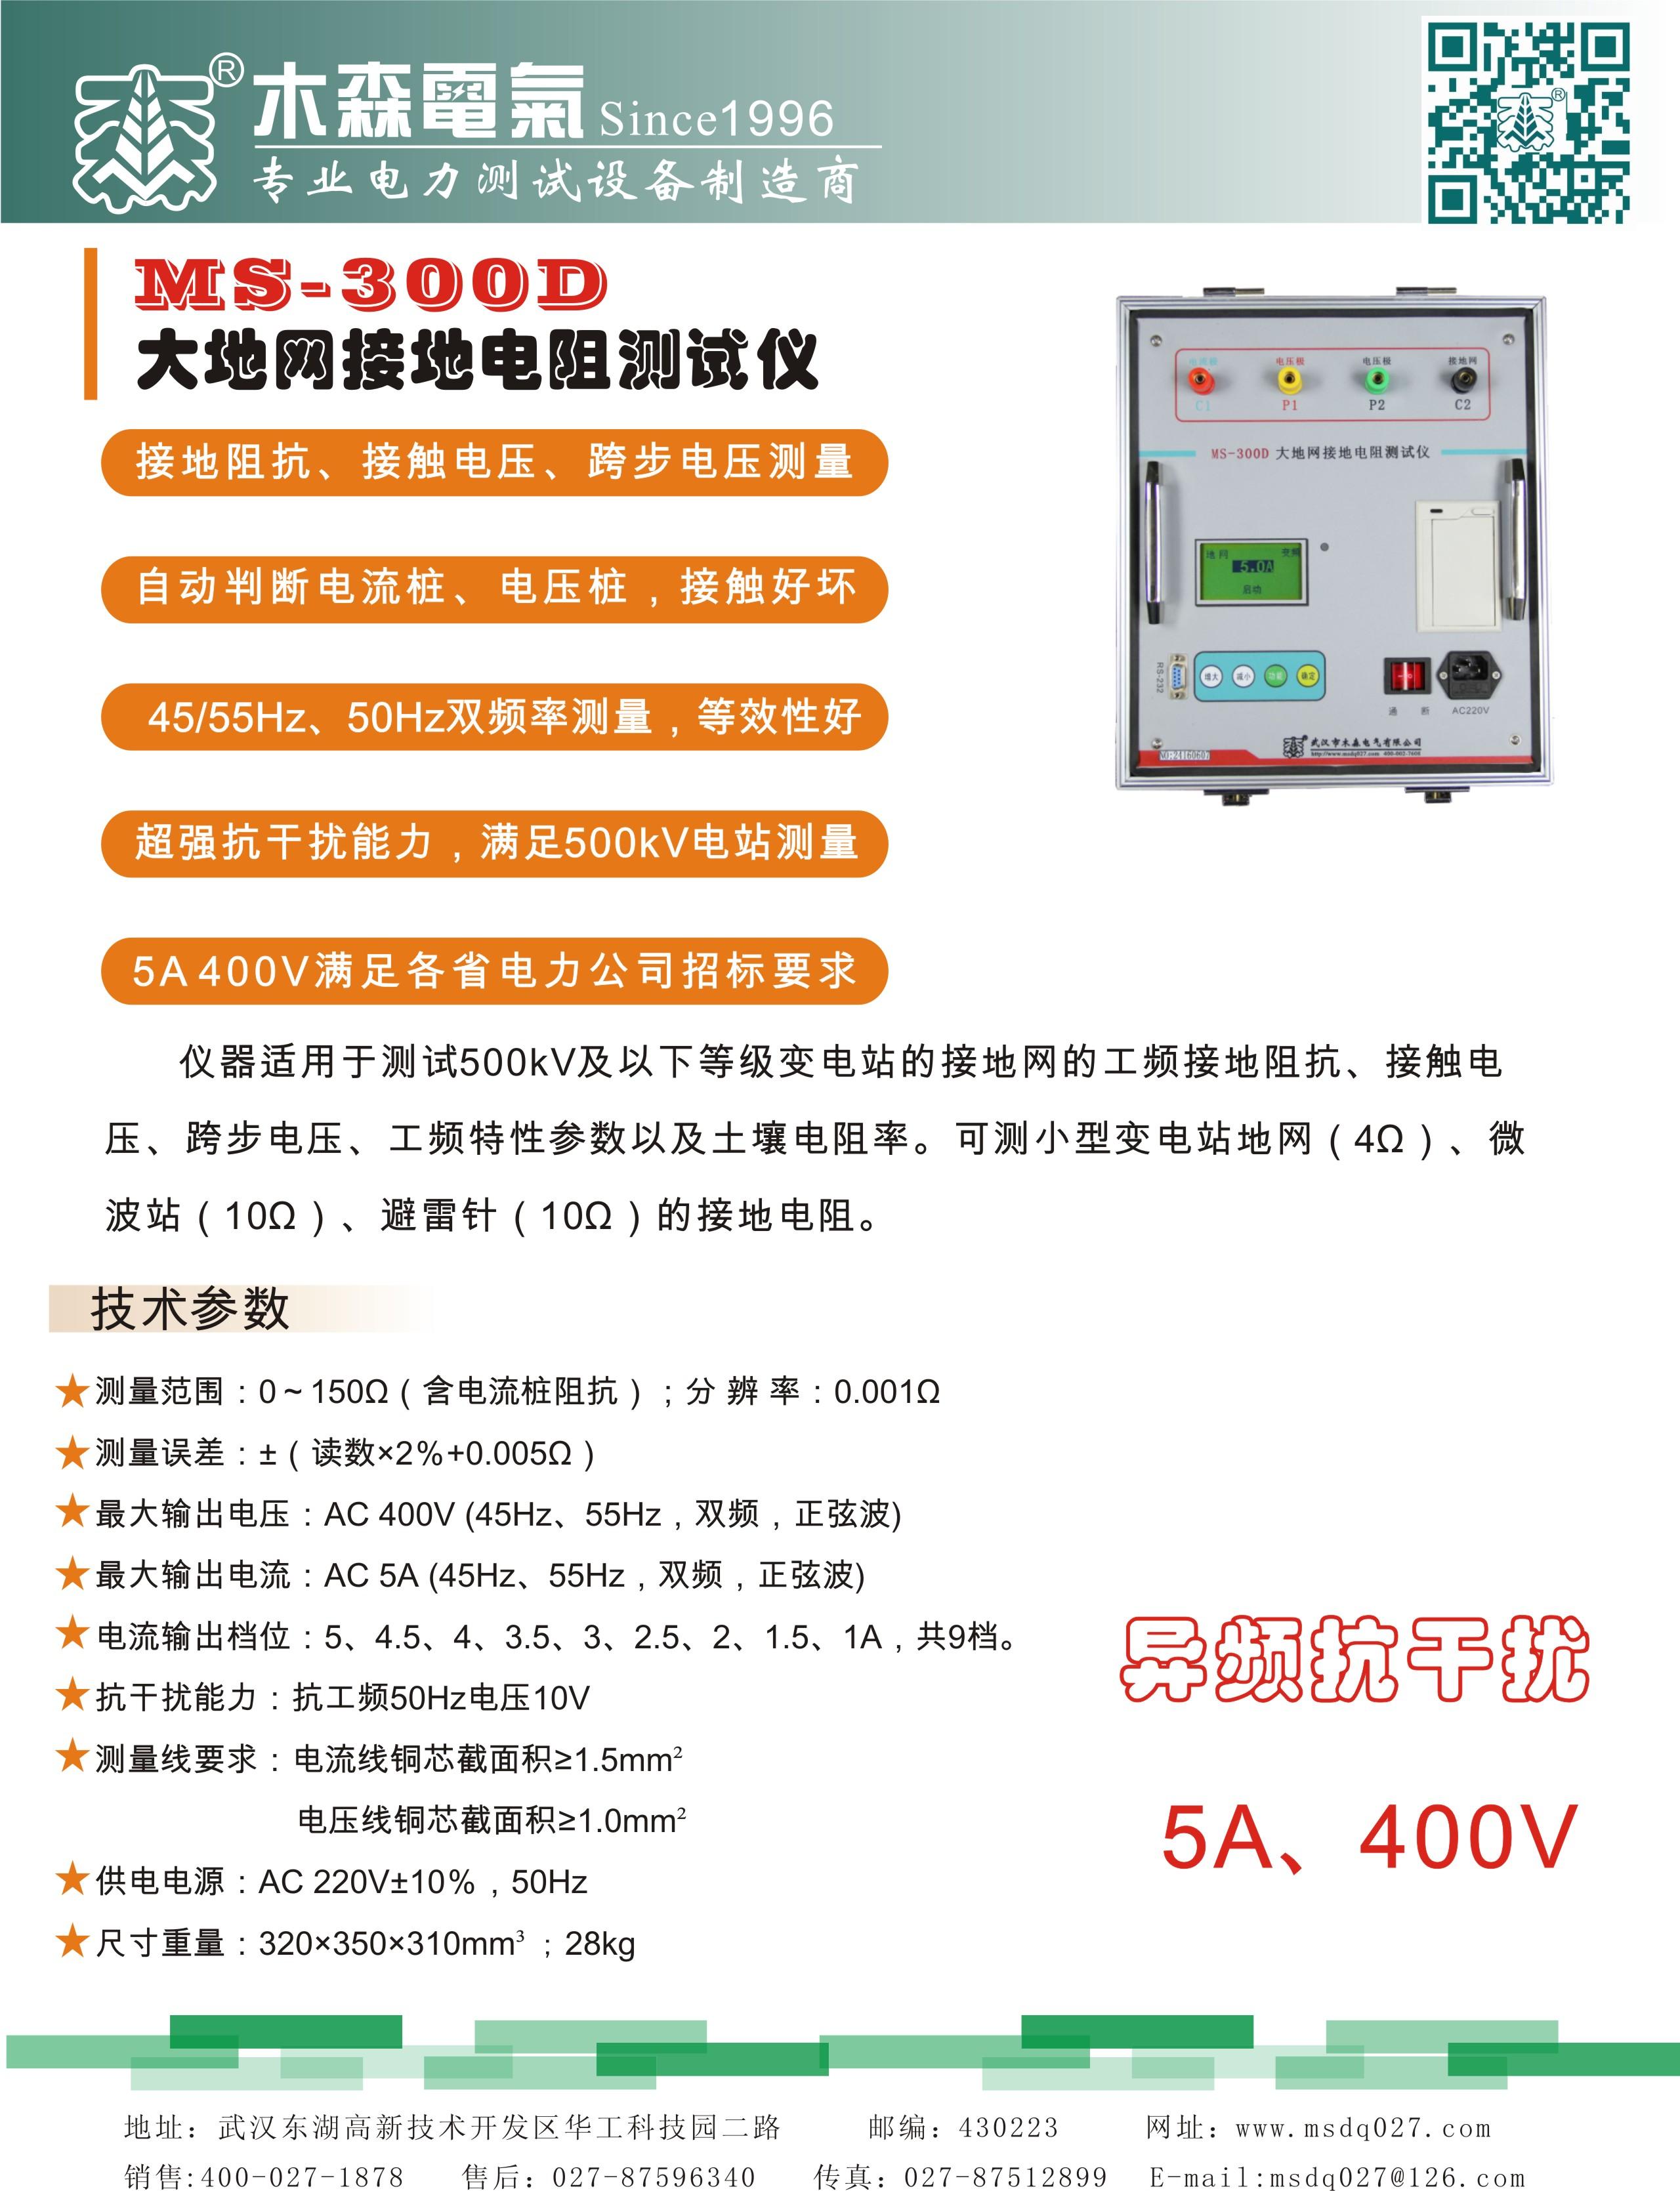 MS-300D大地网接地电阻测试仪